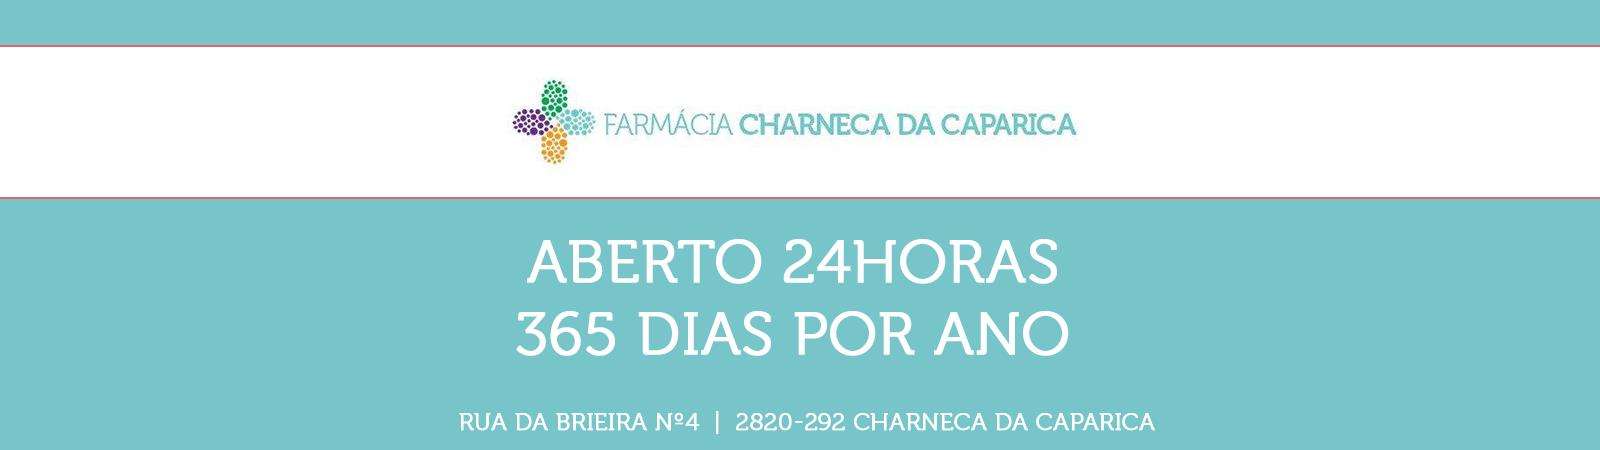 Banner Charneca da Caparica